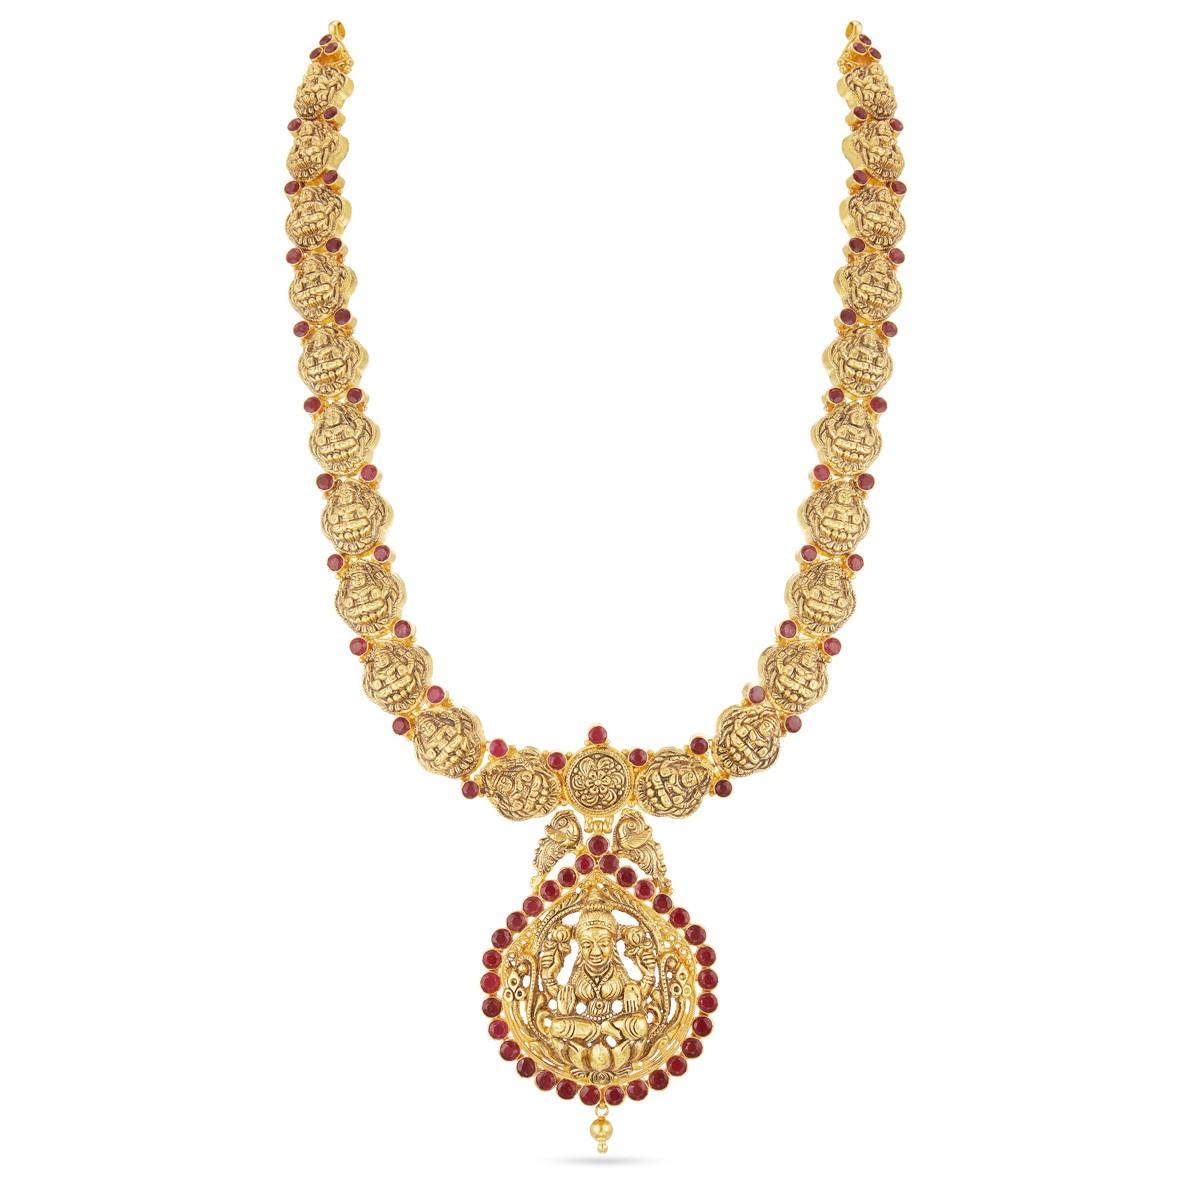 Buy Antique Collection Gold Necklace | Padma Lakshmi Haram Online